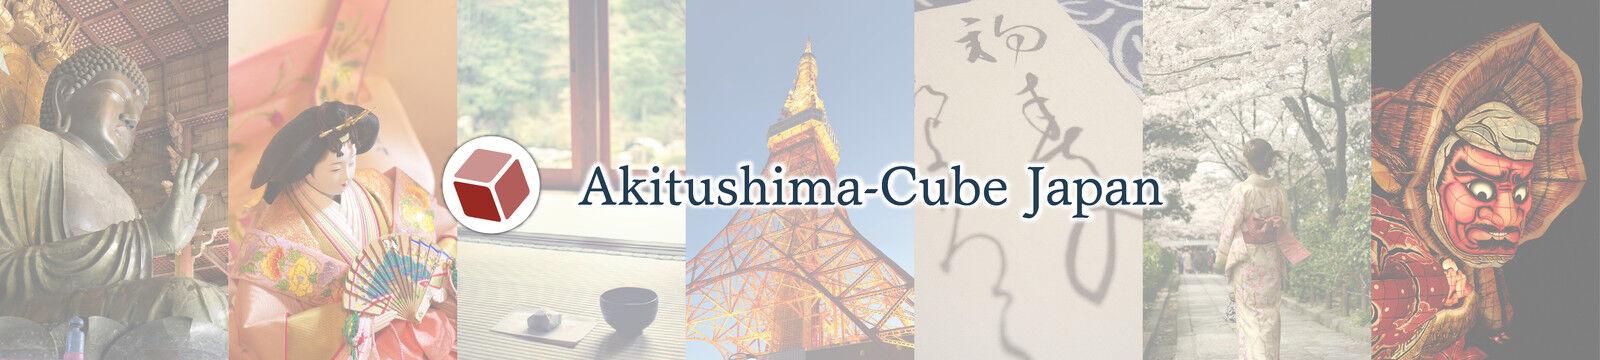 Akitsushima-Cube Japan